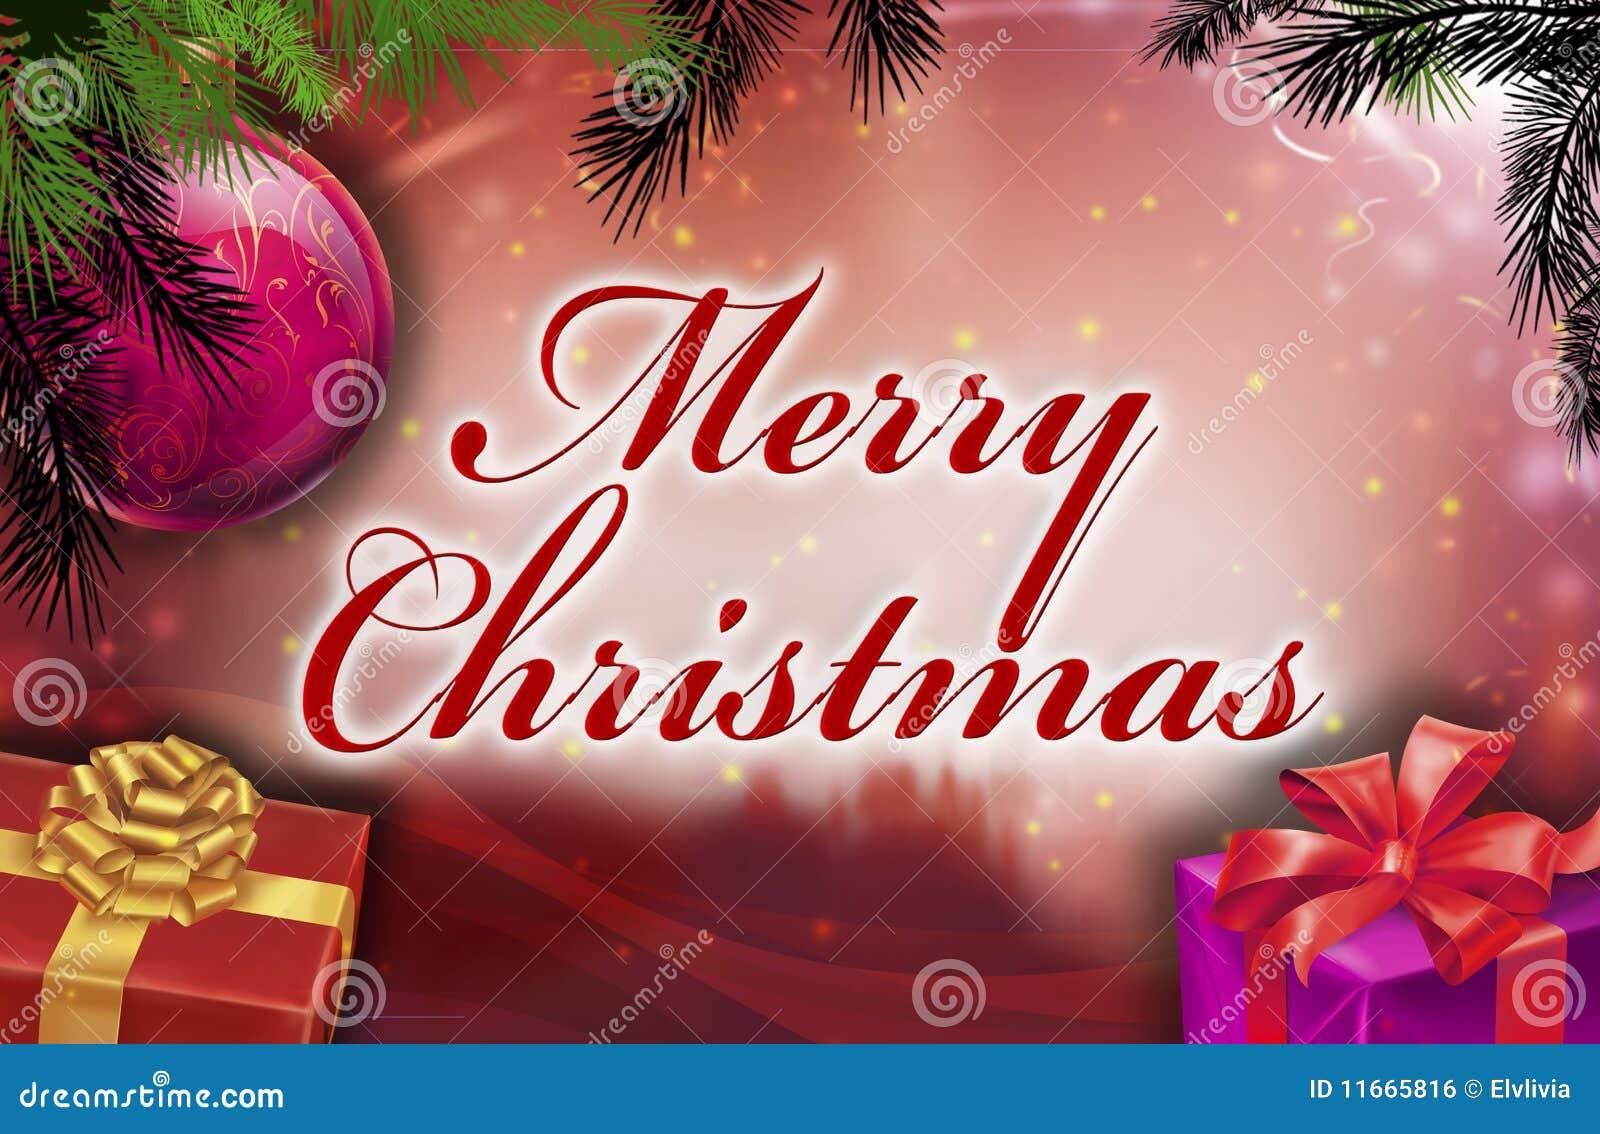 Merry christmas wishes stock illustration. Illustration of